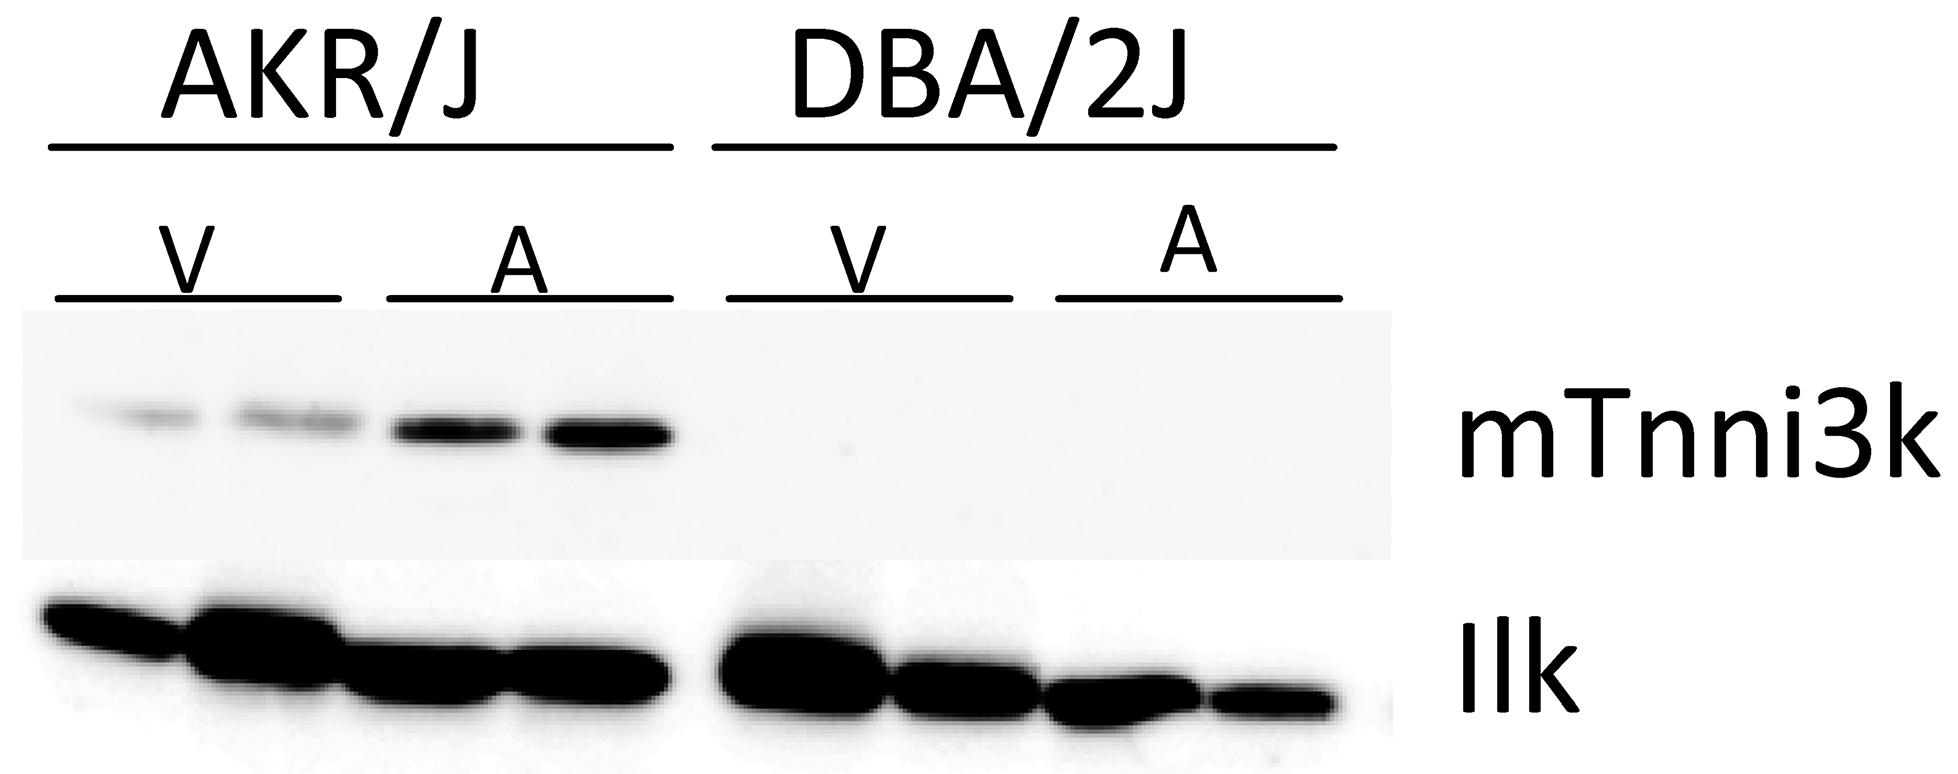 Tnni3k protein levels.